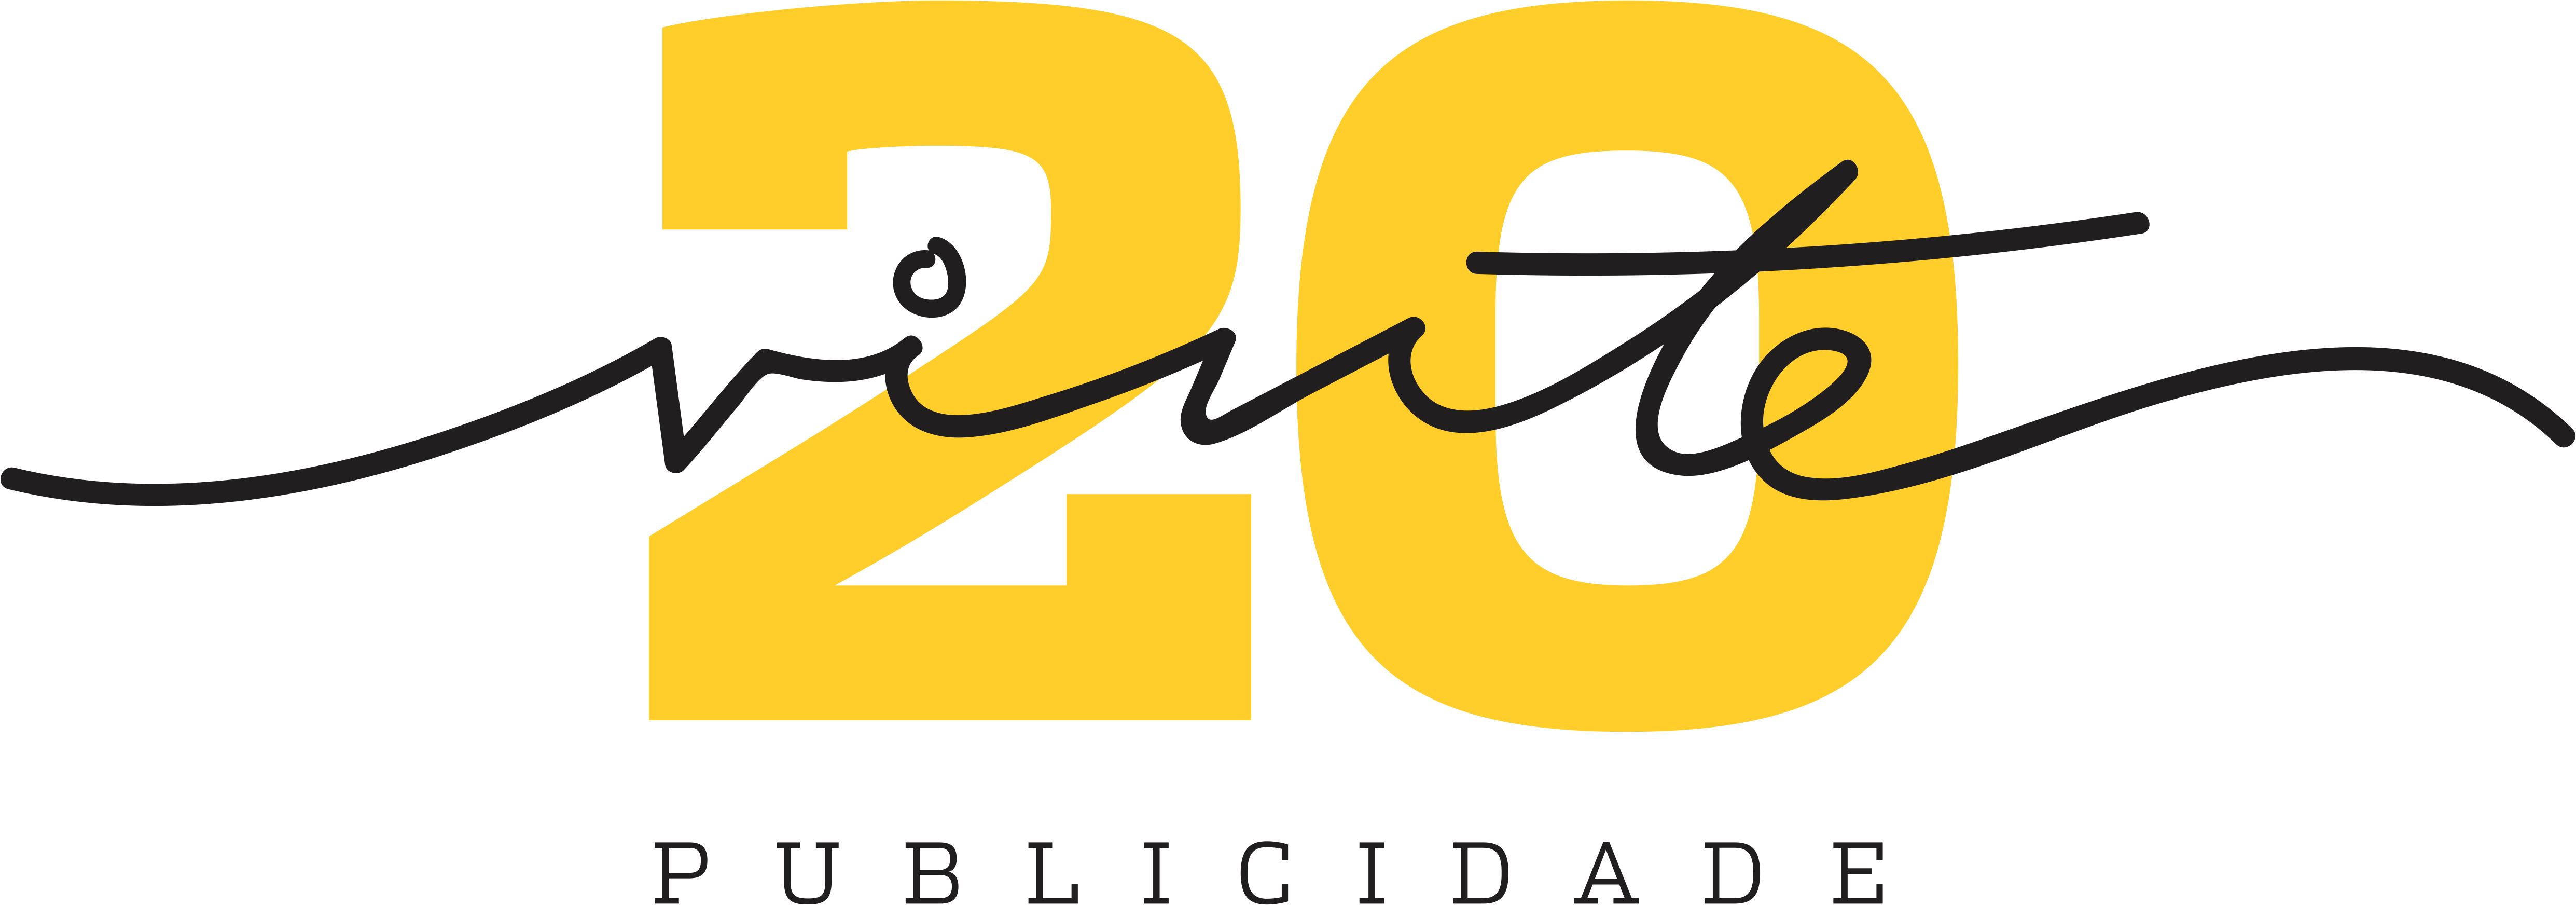 vinte20-logo